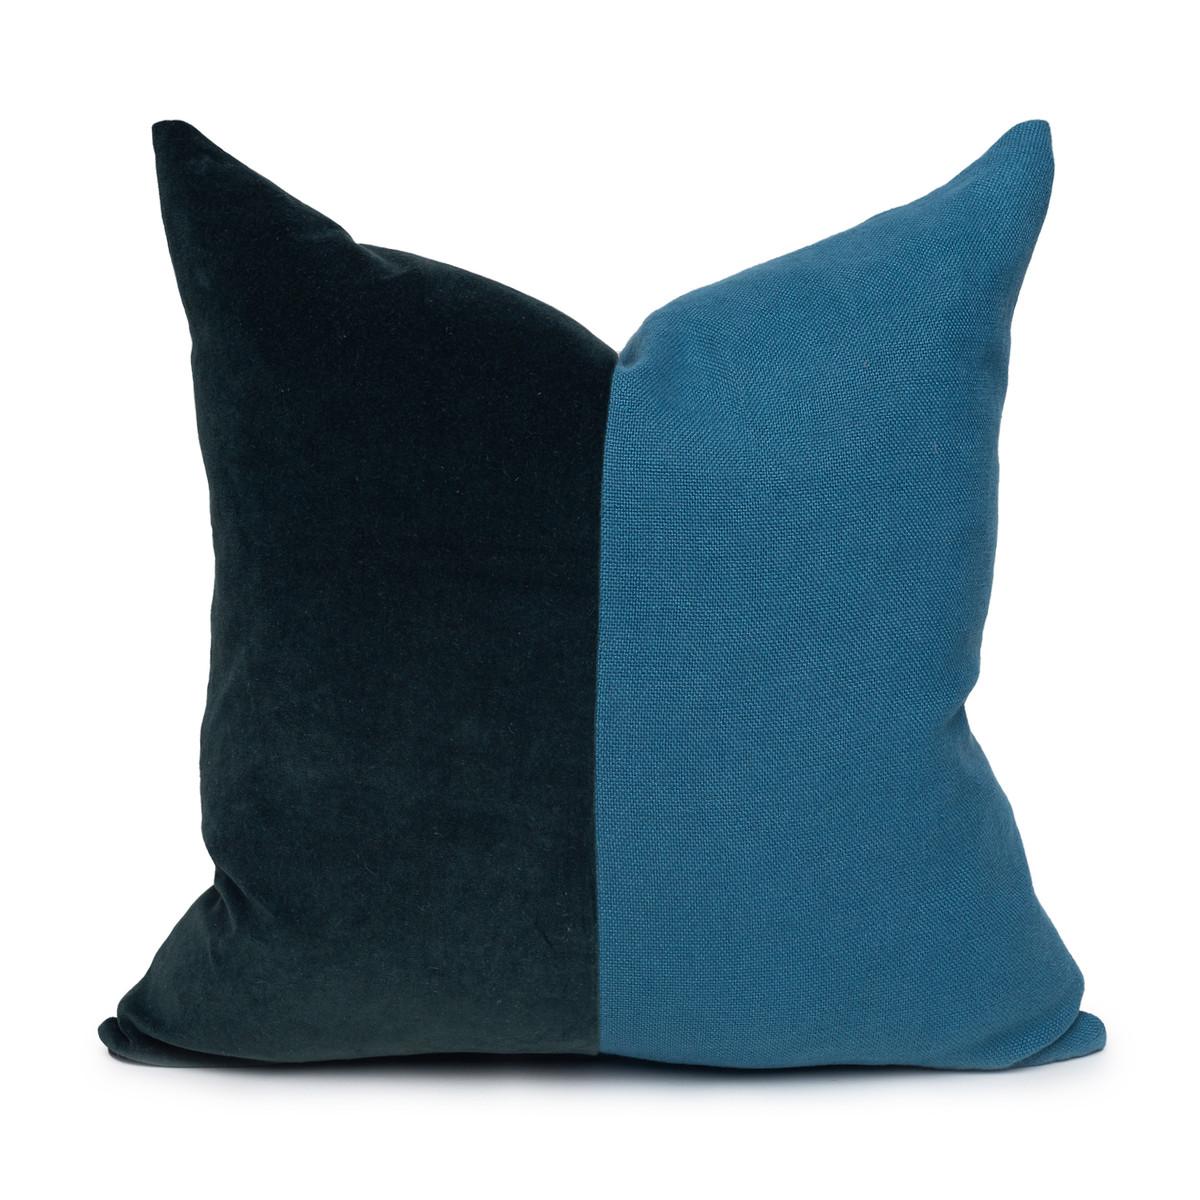 Saint Tourmaline Velvet pillow & Delphi linen- 20 x 20 - front